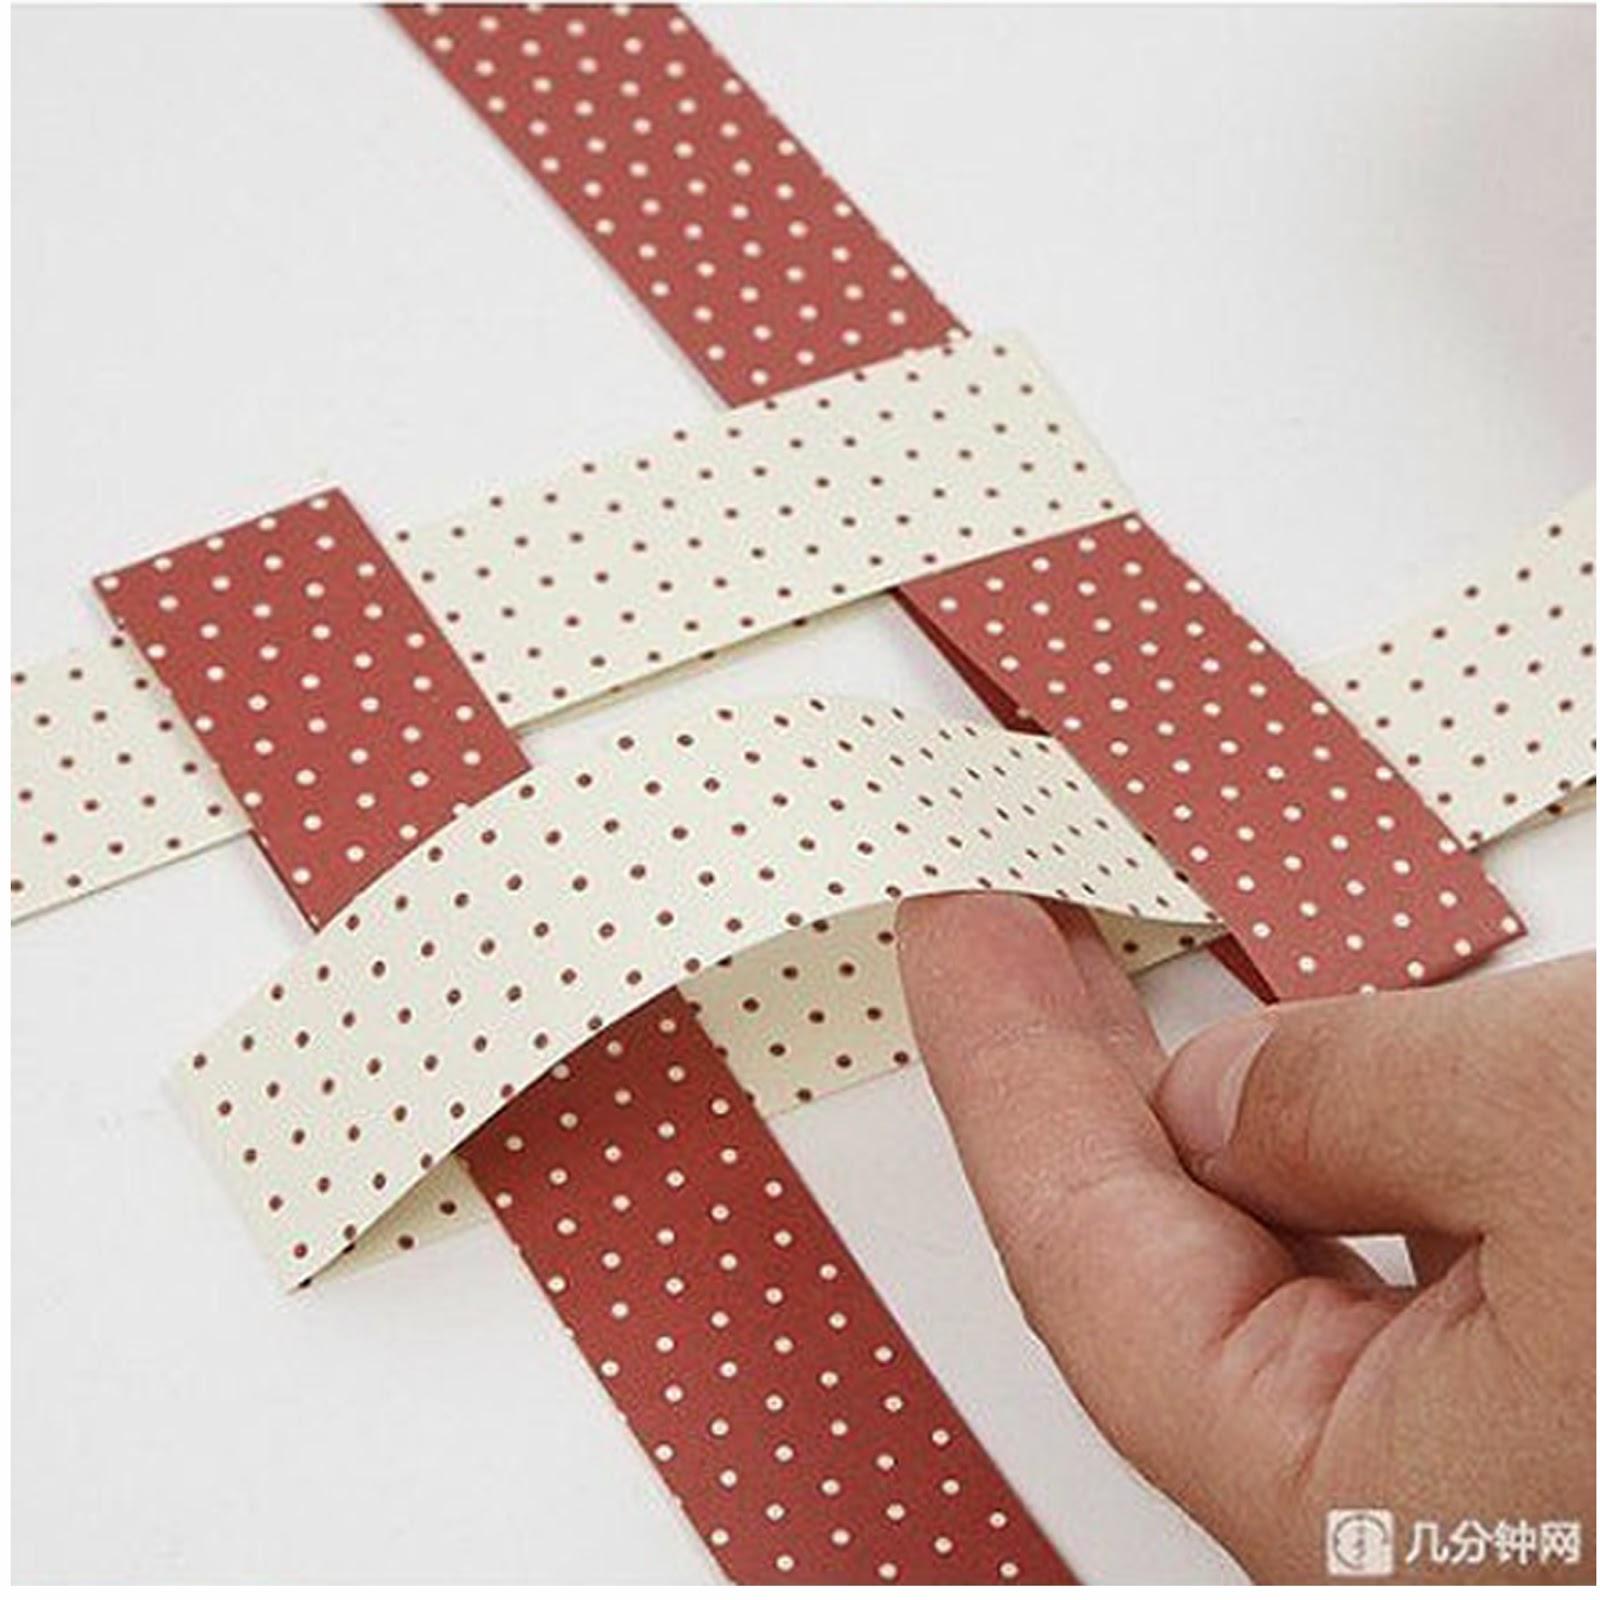 Star Festivel: 3D Star Origami | Paper Origami Guide